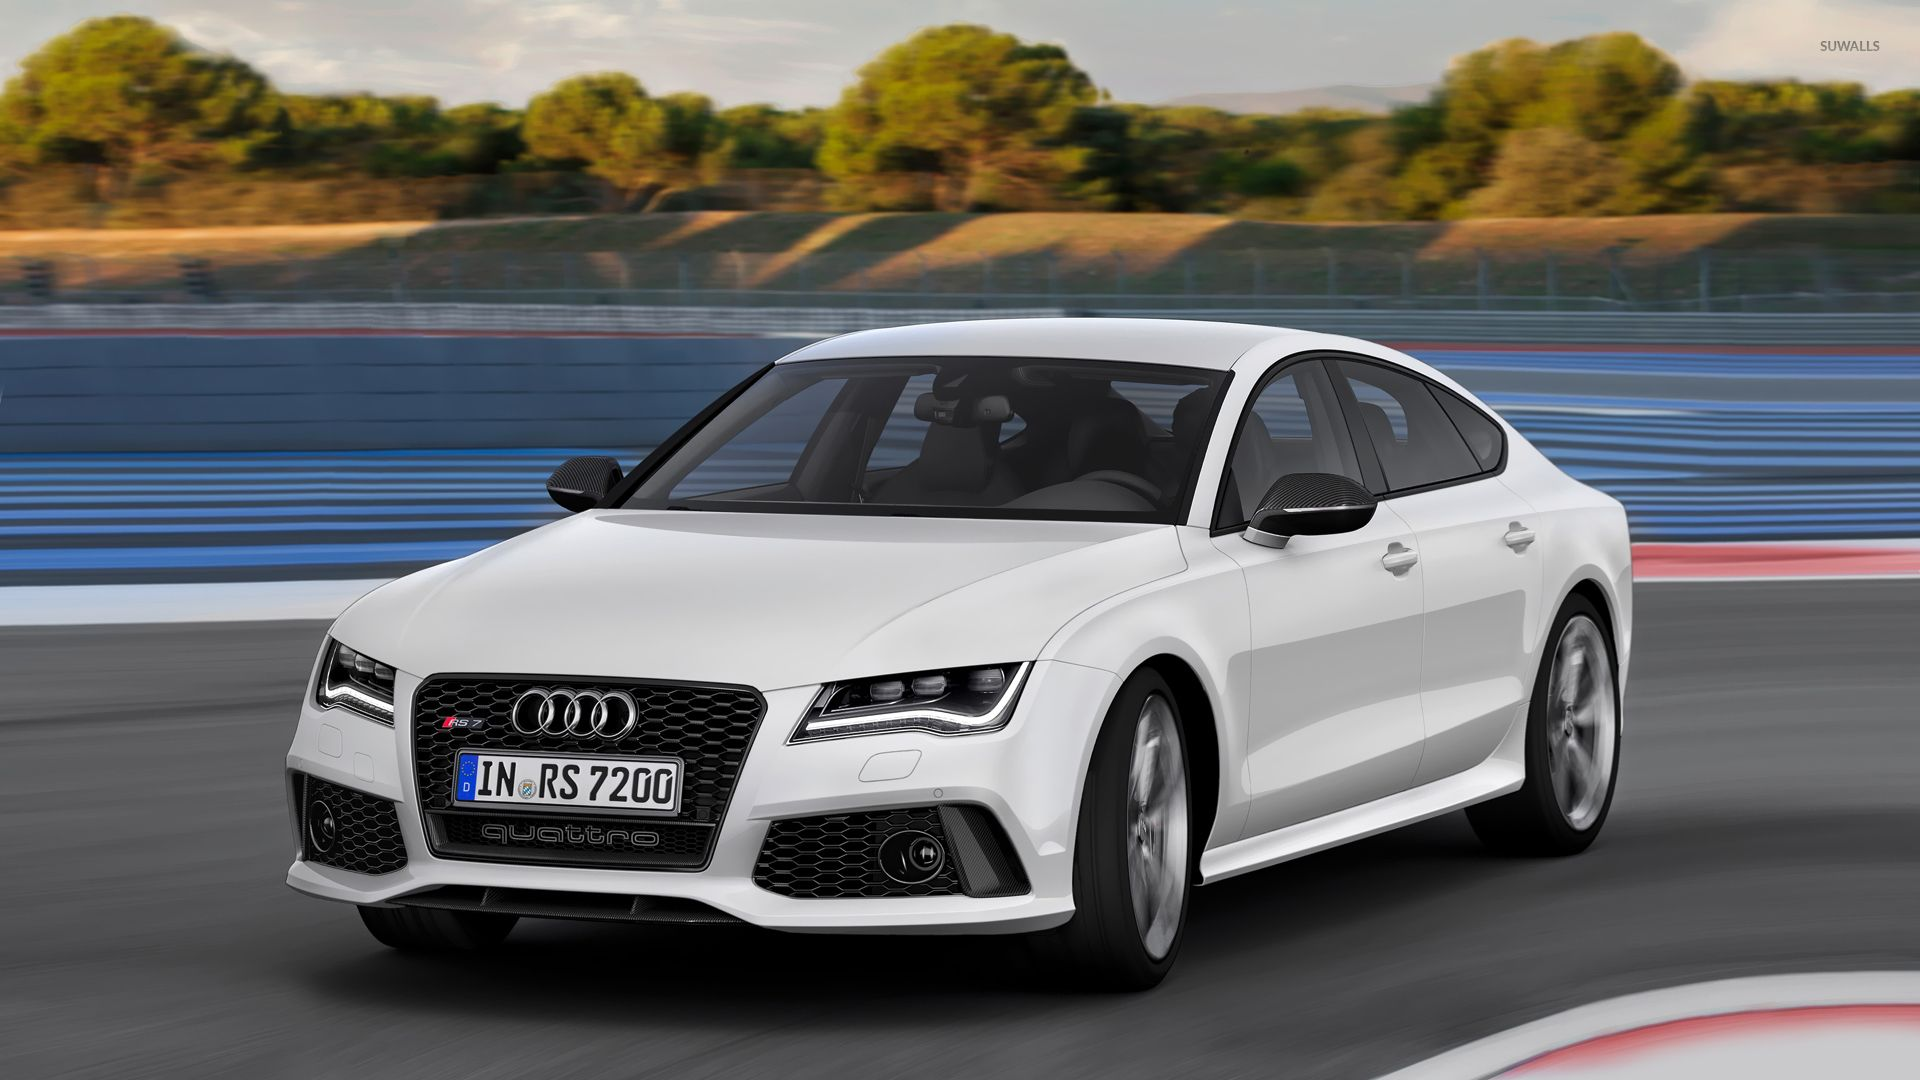 Get Inspired For Full Hd Audi Car Wallpaper For Mobile Photos In 2021 Audi Cars Audi Audi Cars Wallpapers